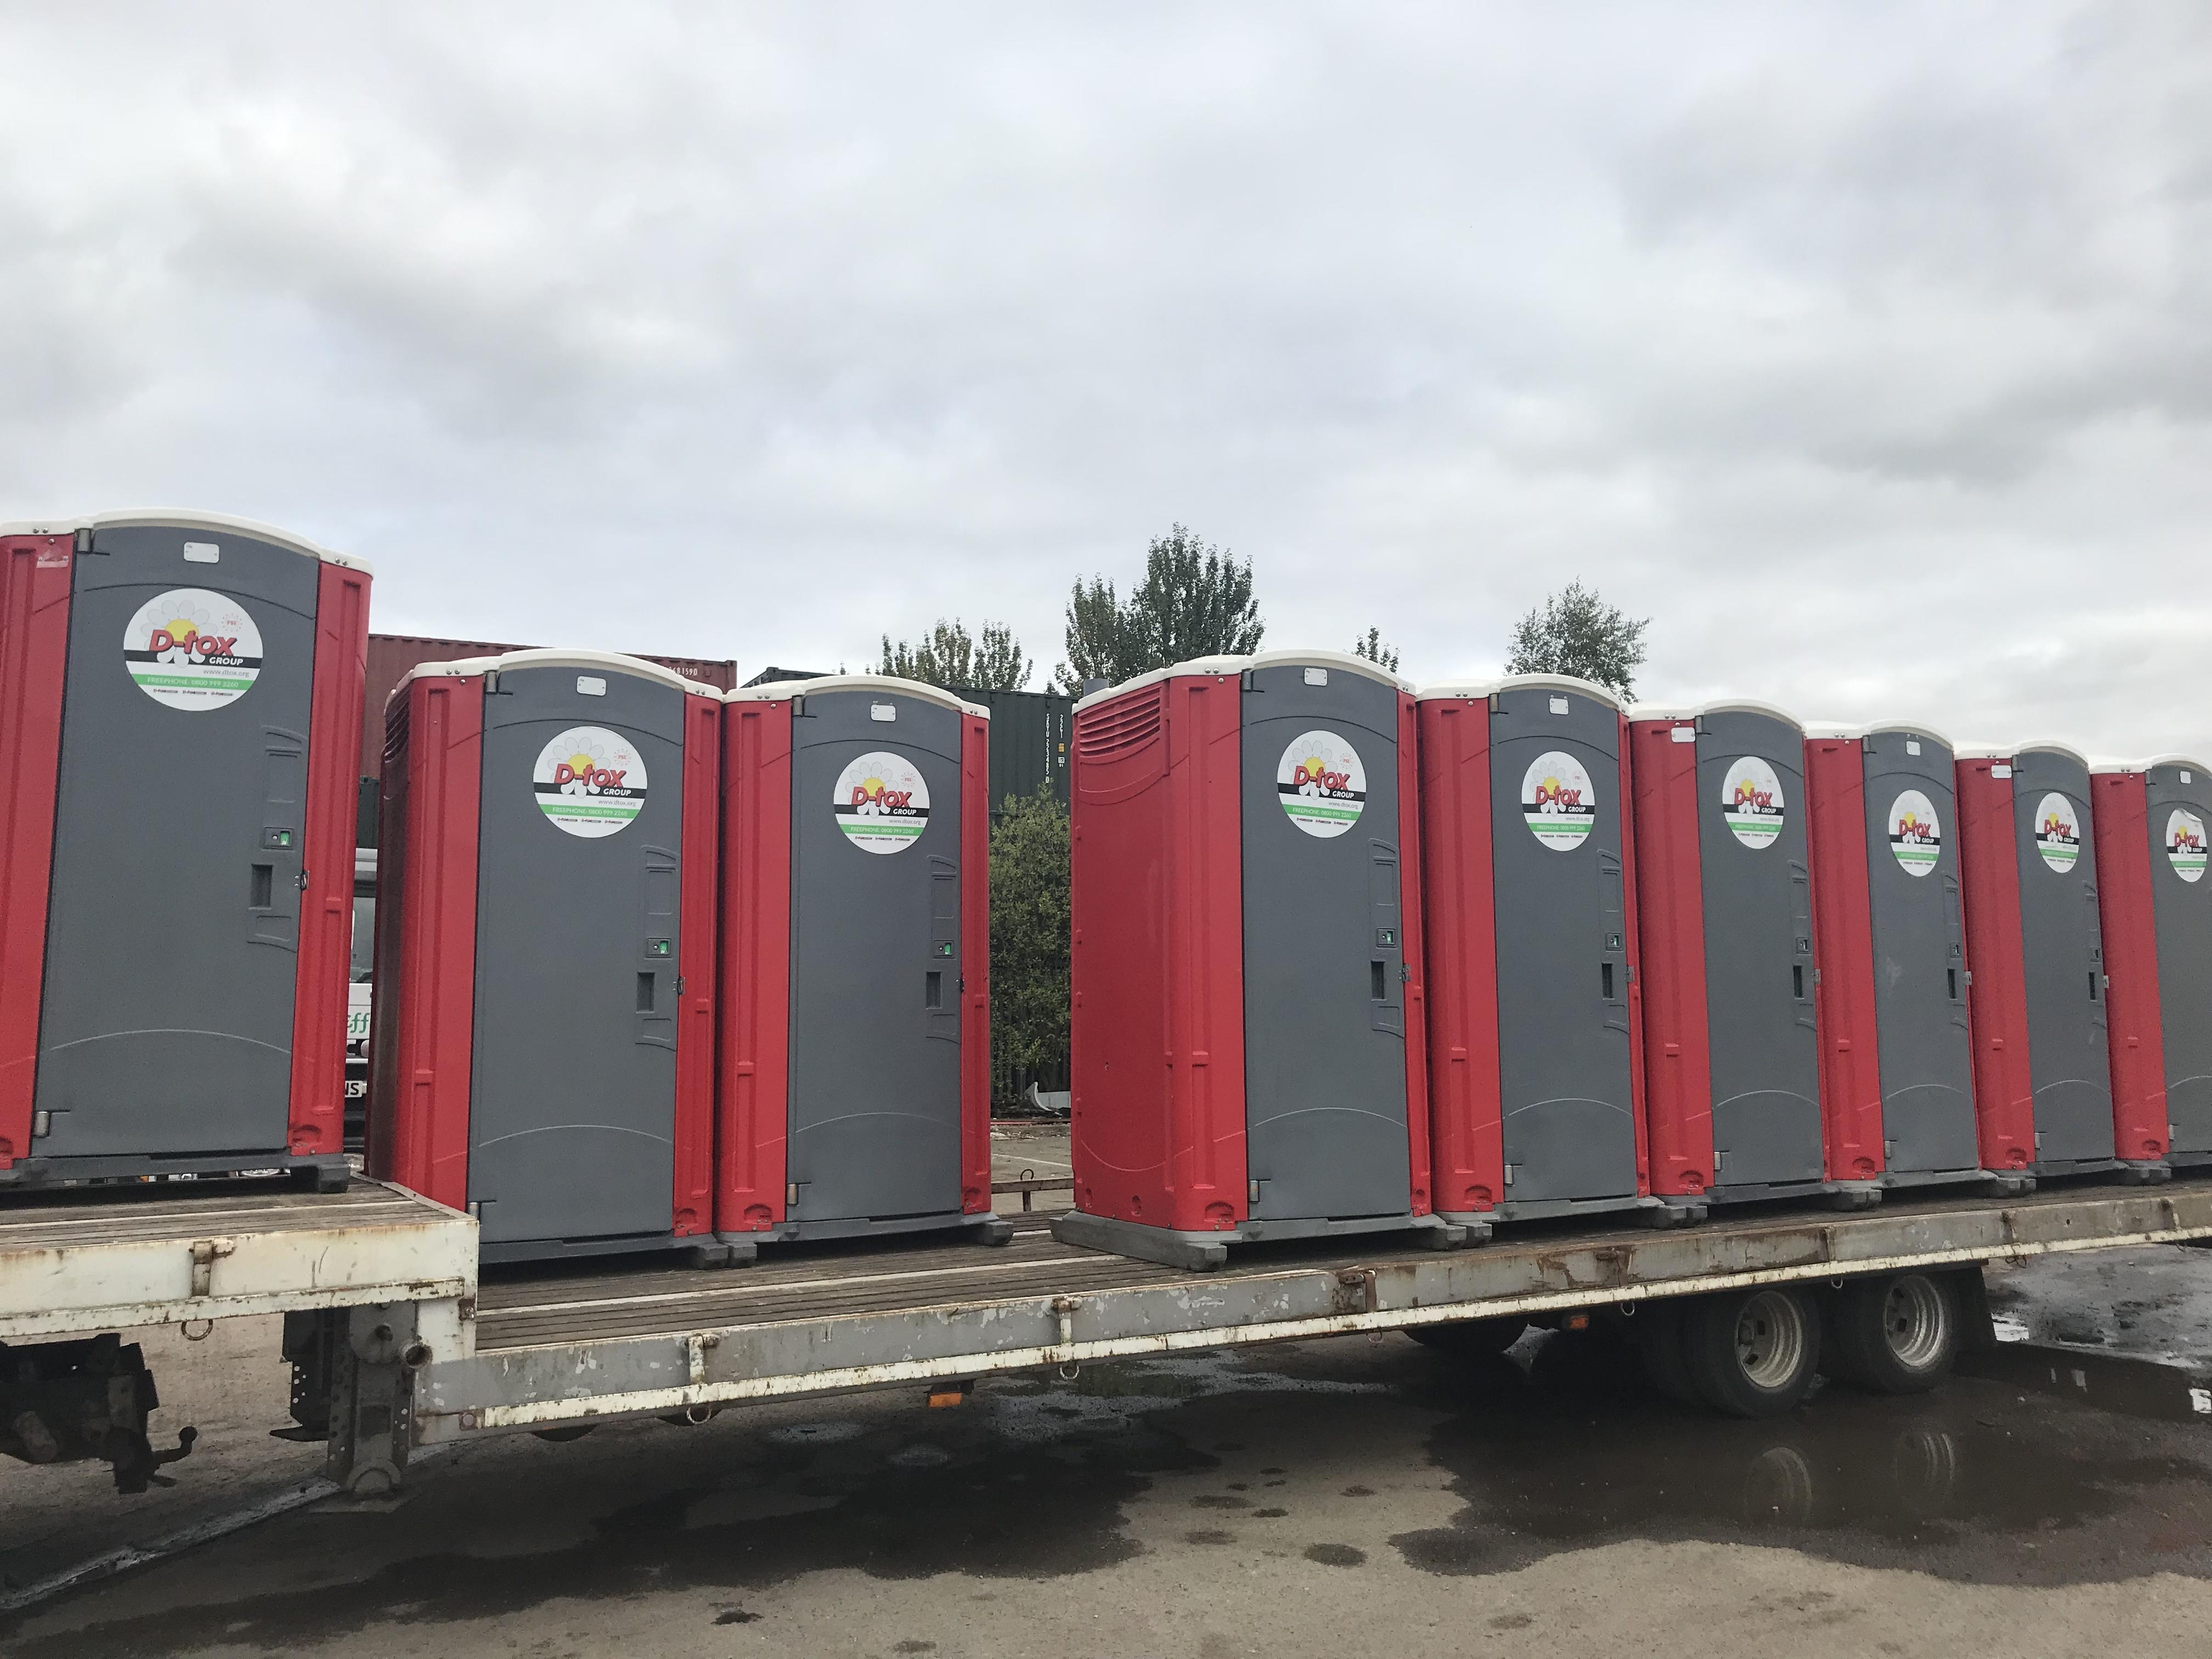 toilet hire for music festivals around the Midlands region